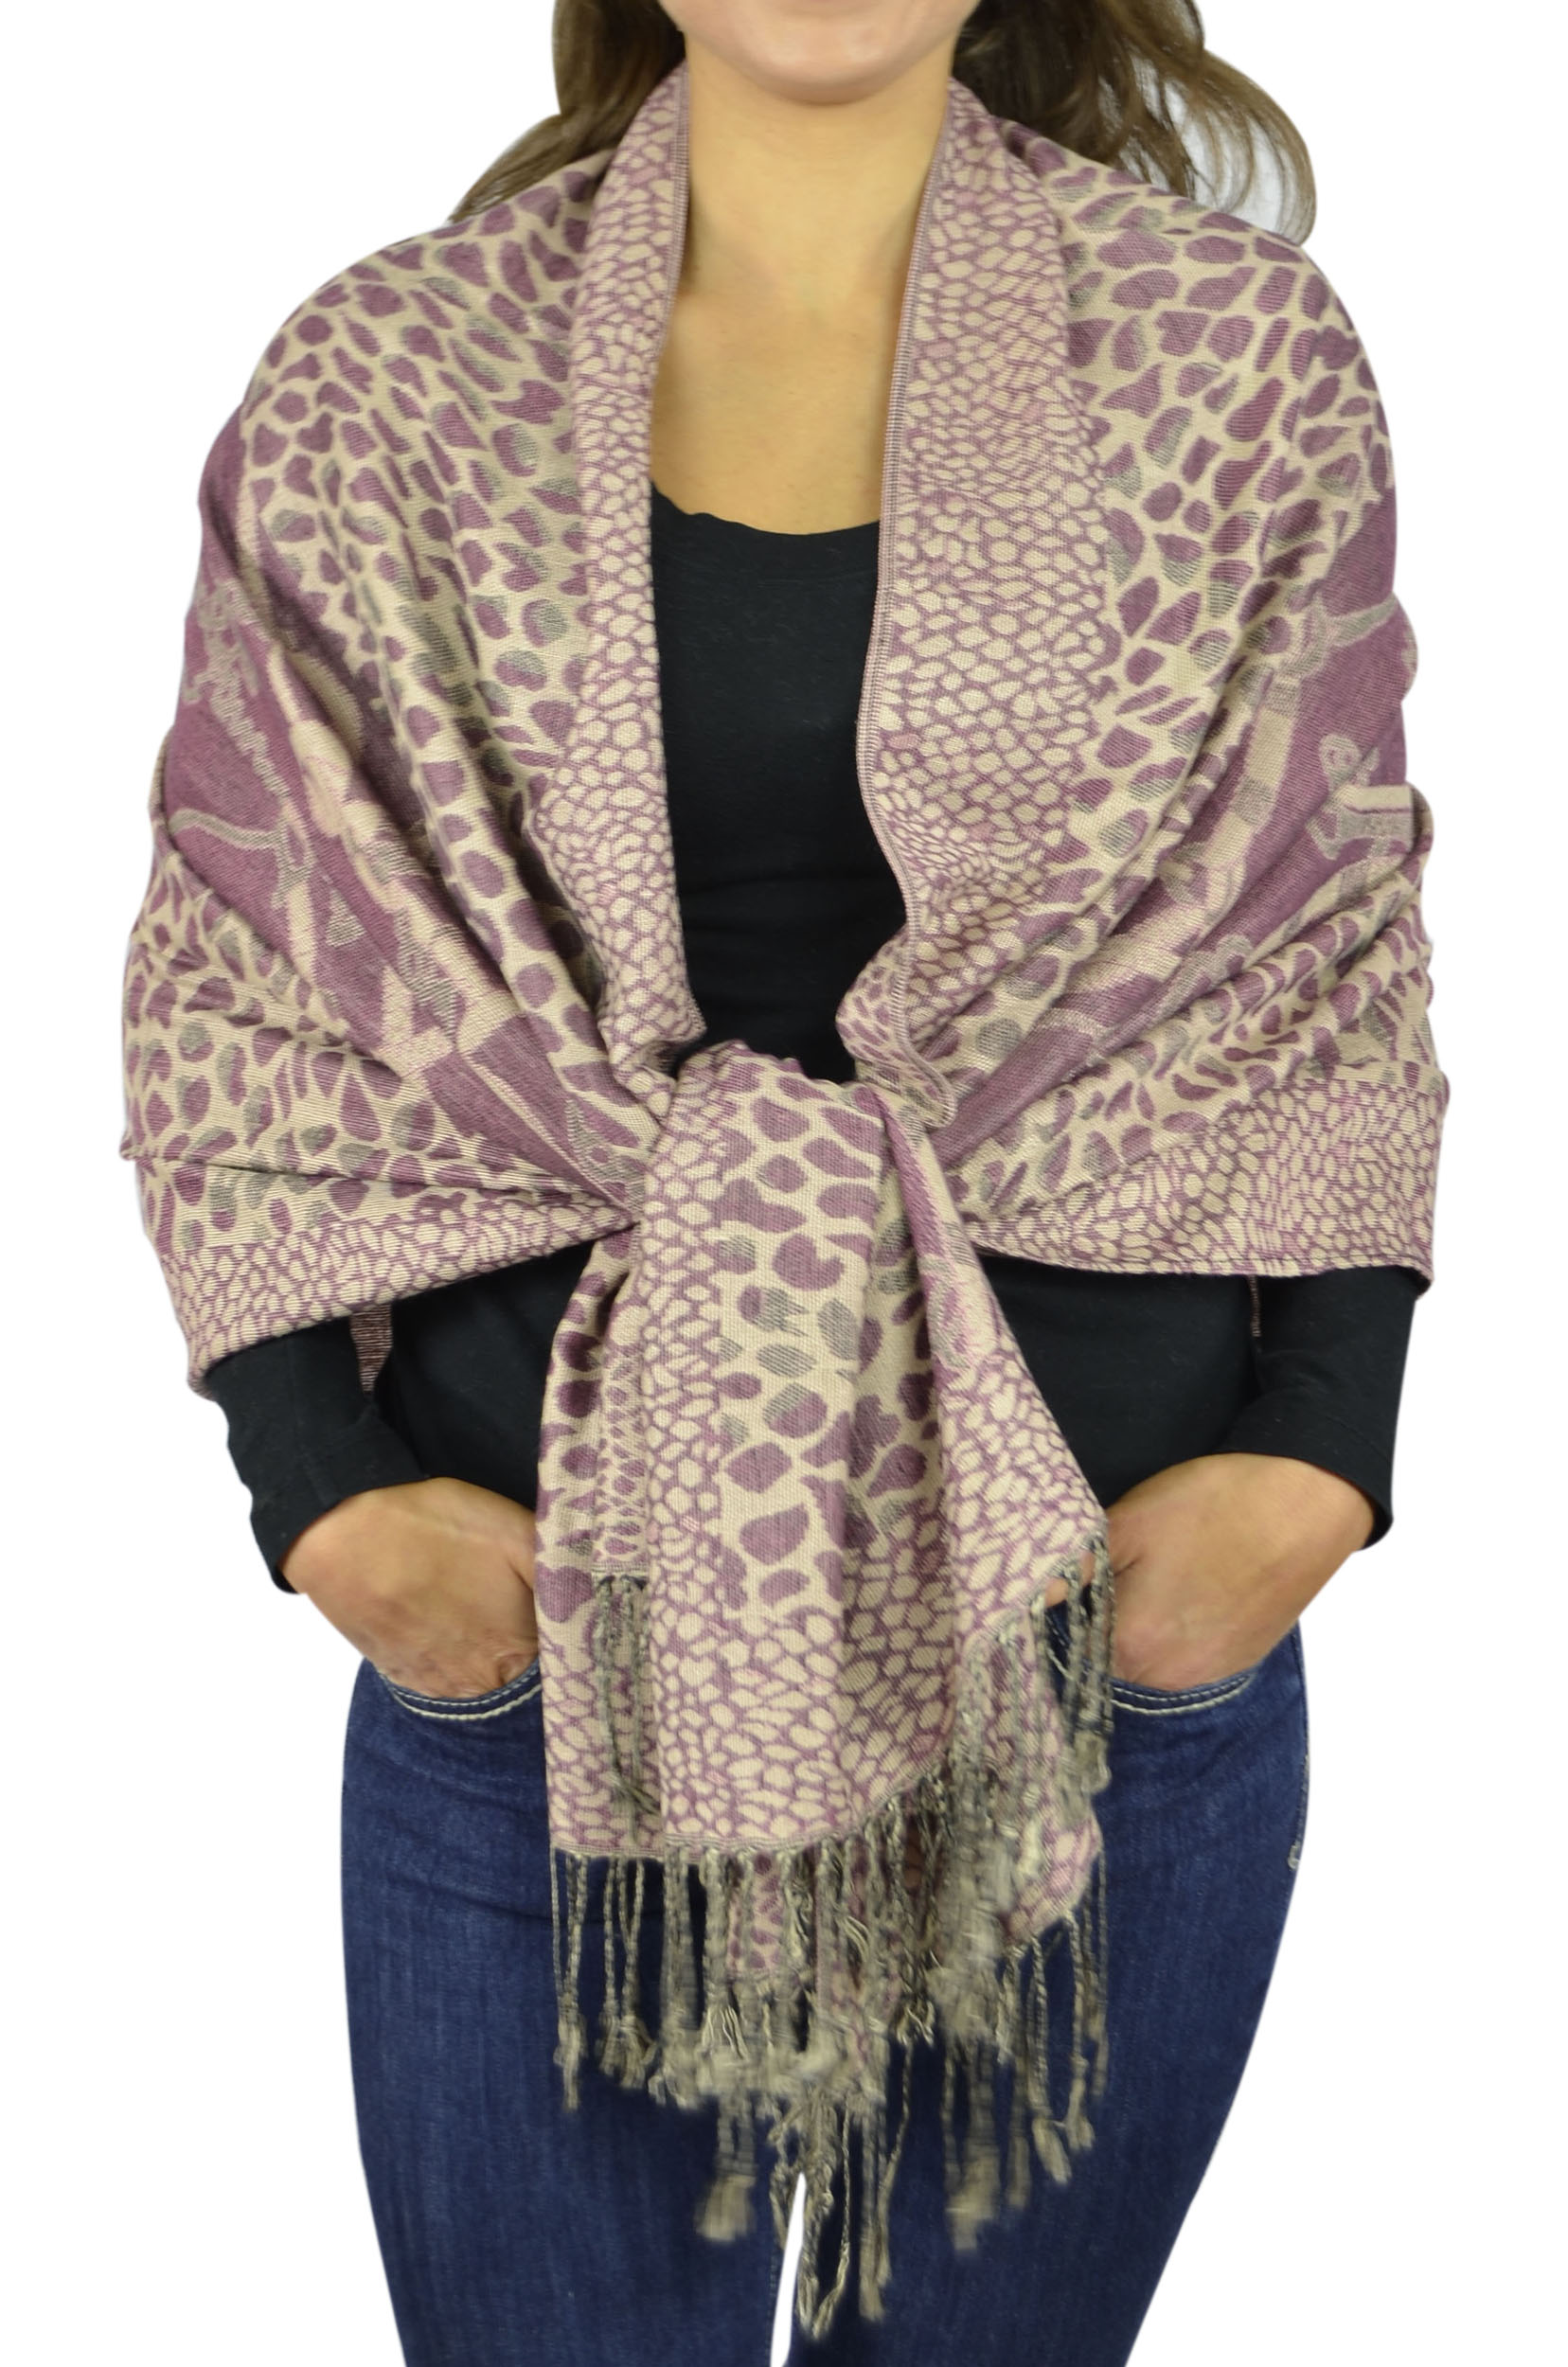 Pashmina Women Soft Wrap Shawl Animal Print Scarf By Belle Donne - Deep Burgundy